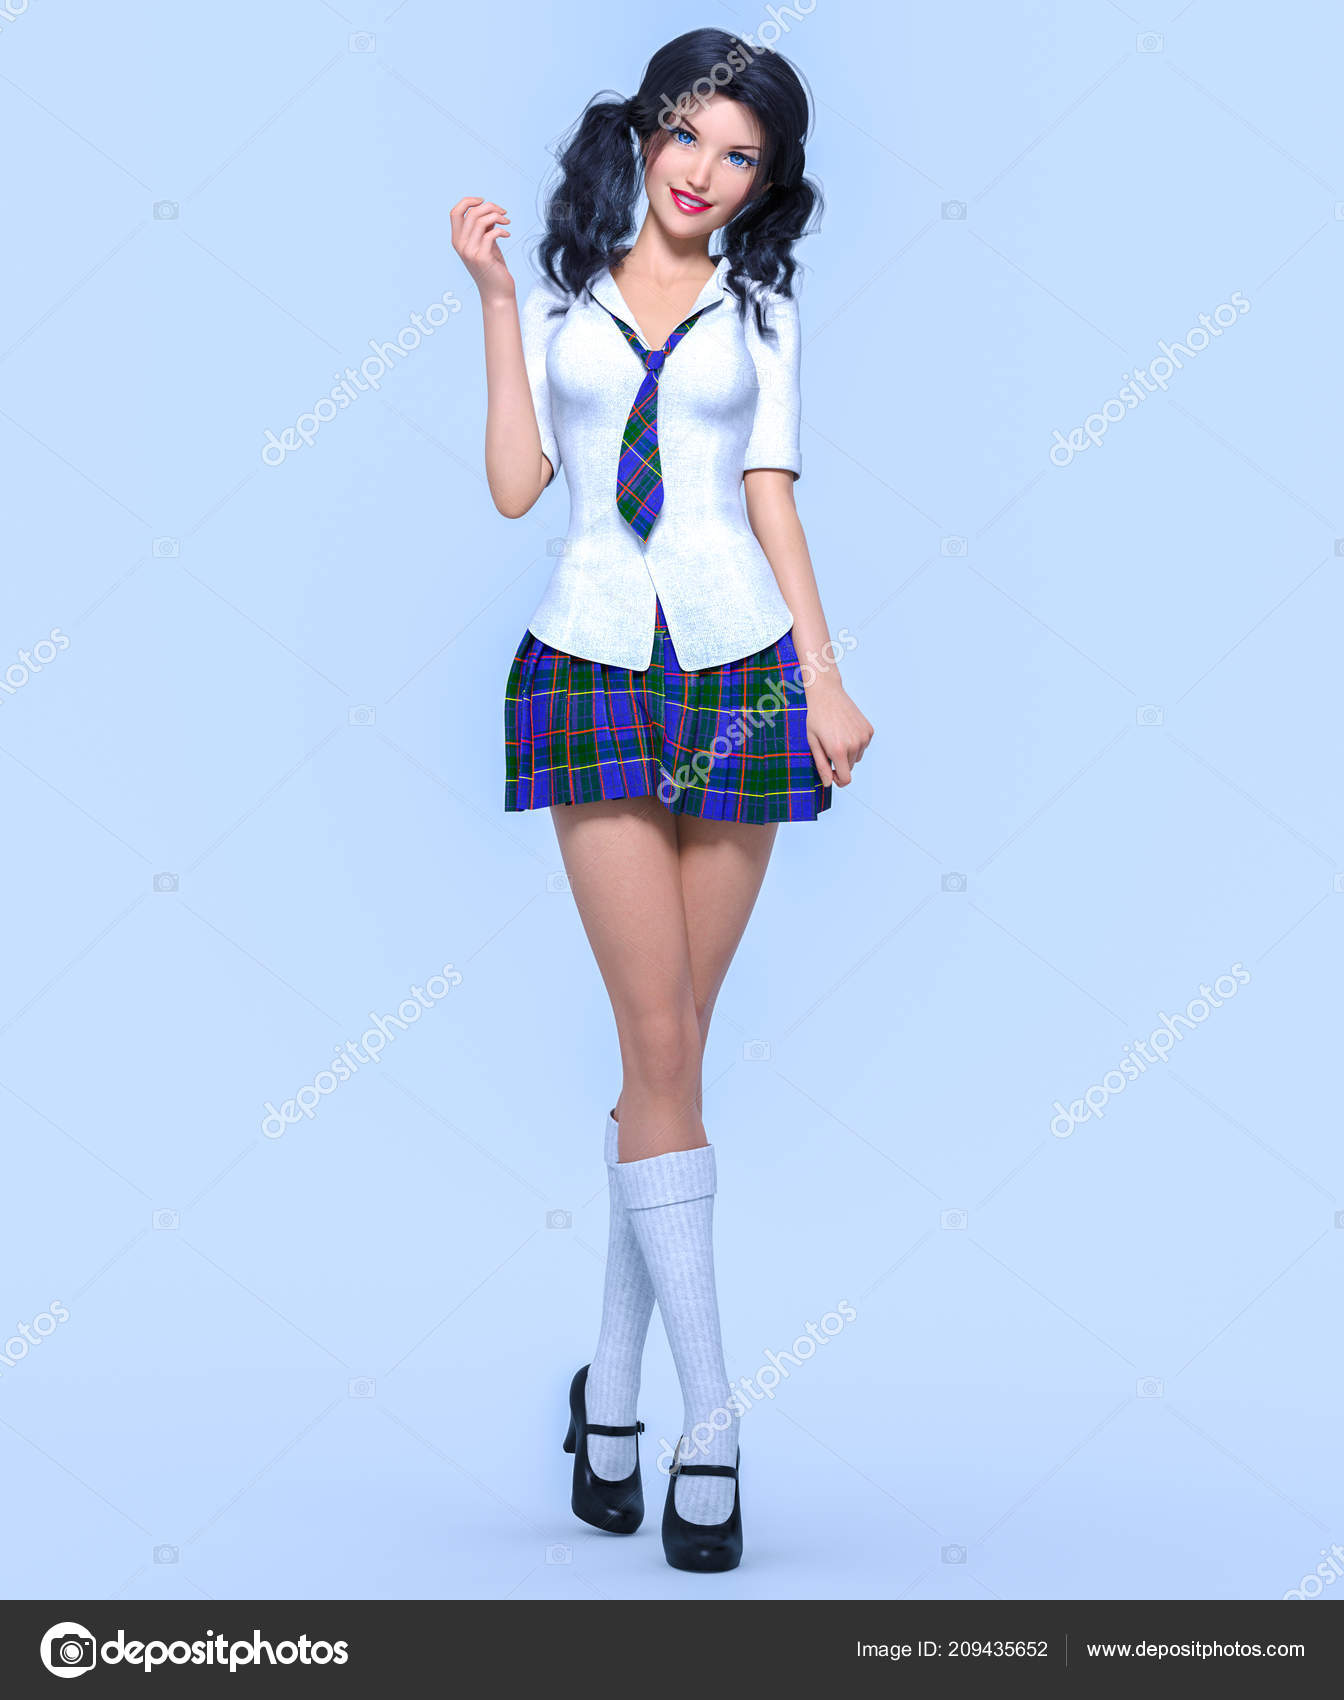 Pics of young girls in school uniform